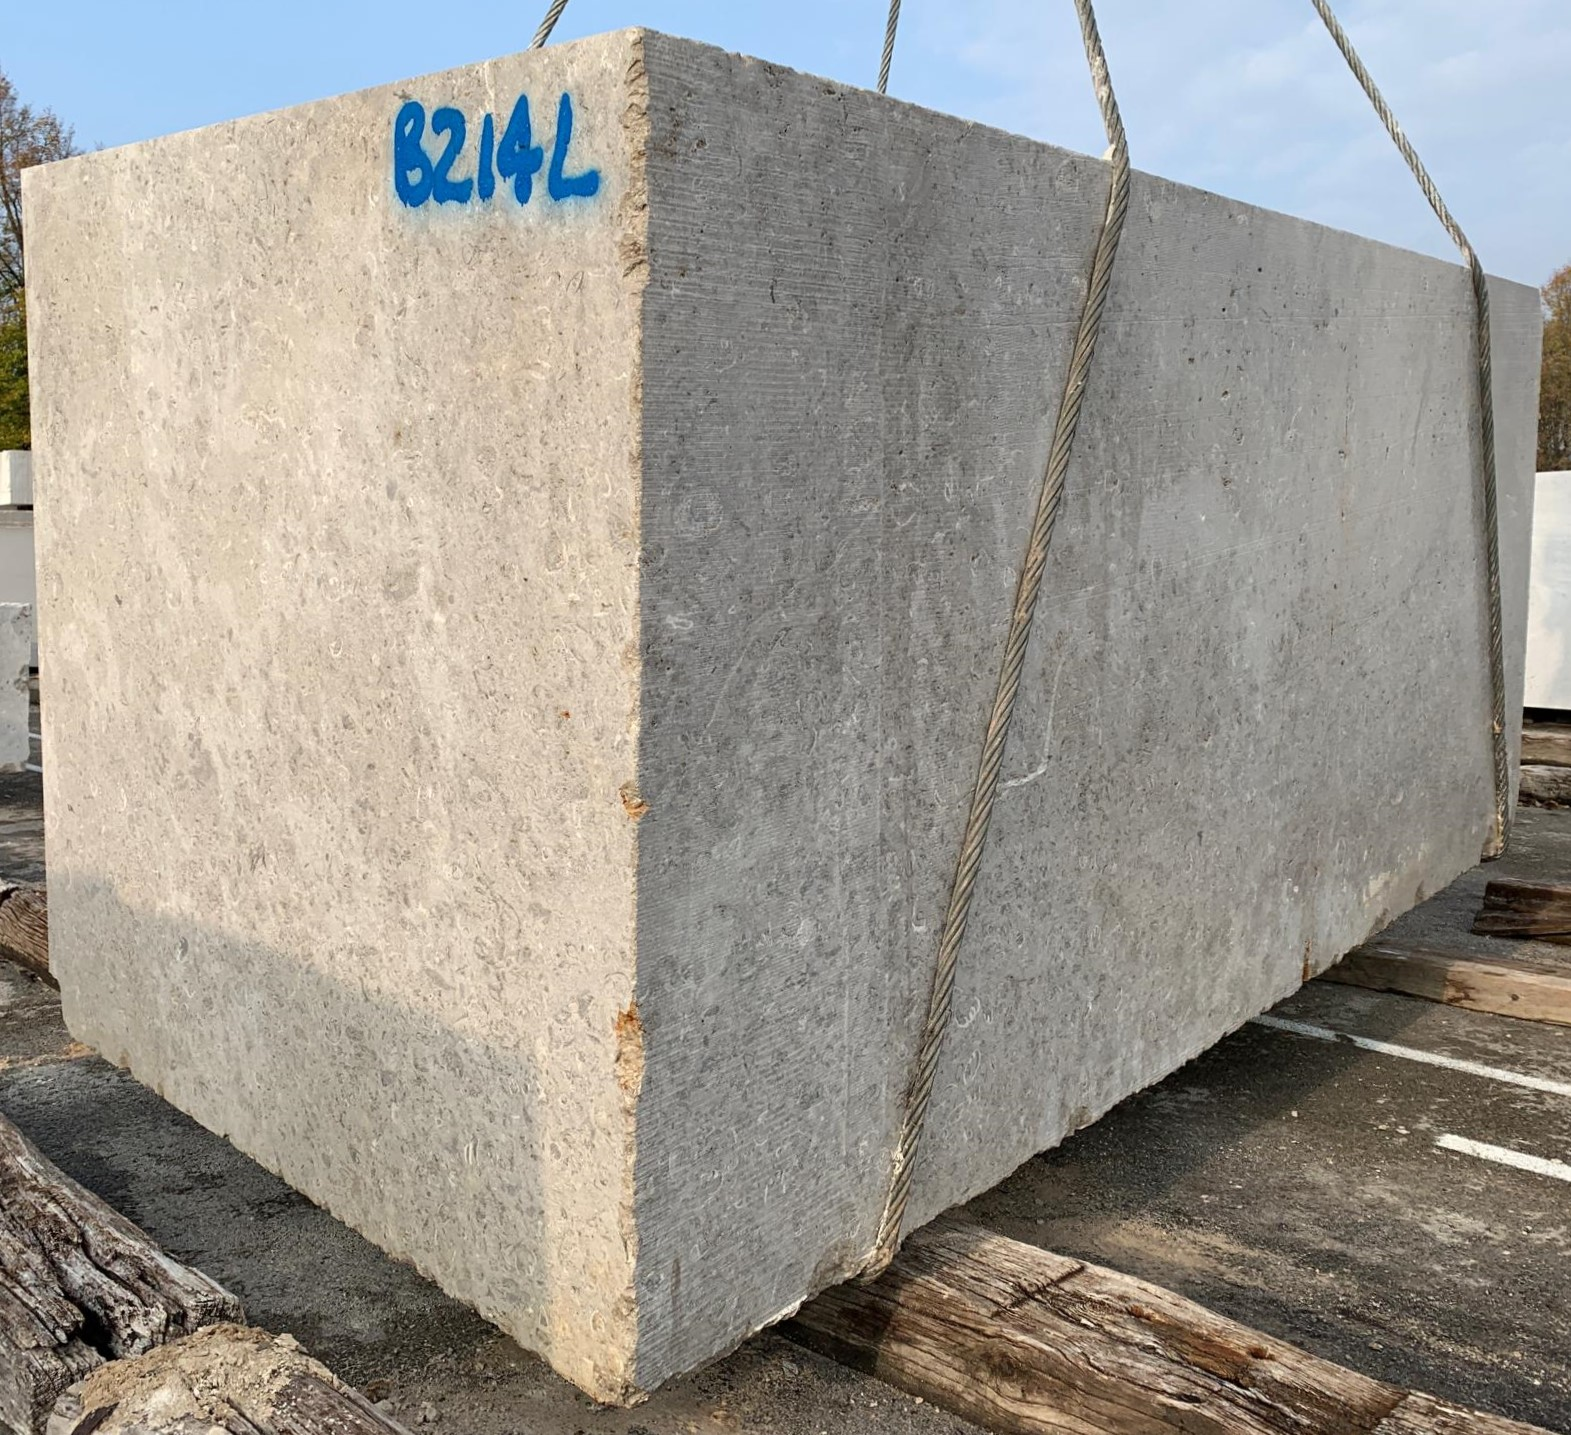 B214L - 340x163x143cm - 21.00tn (1)